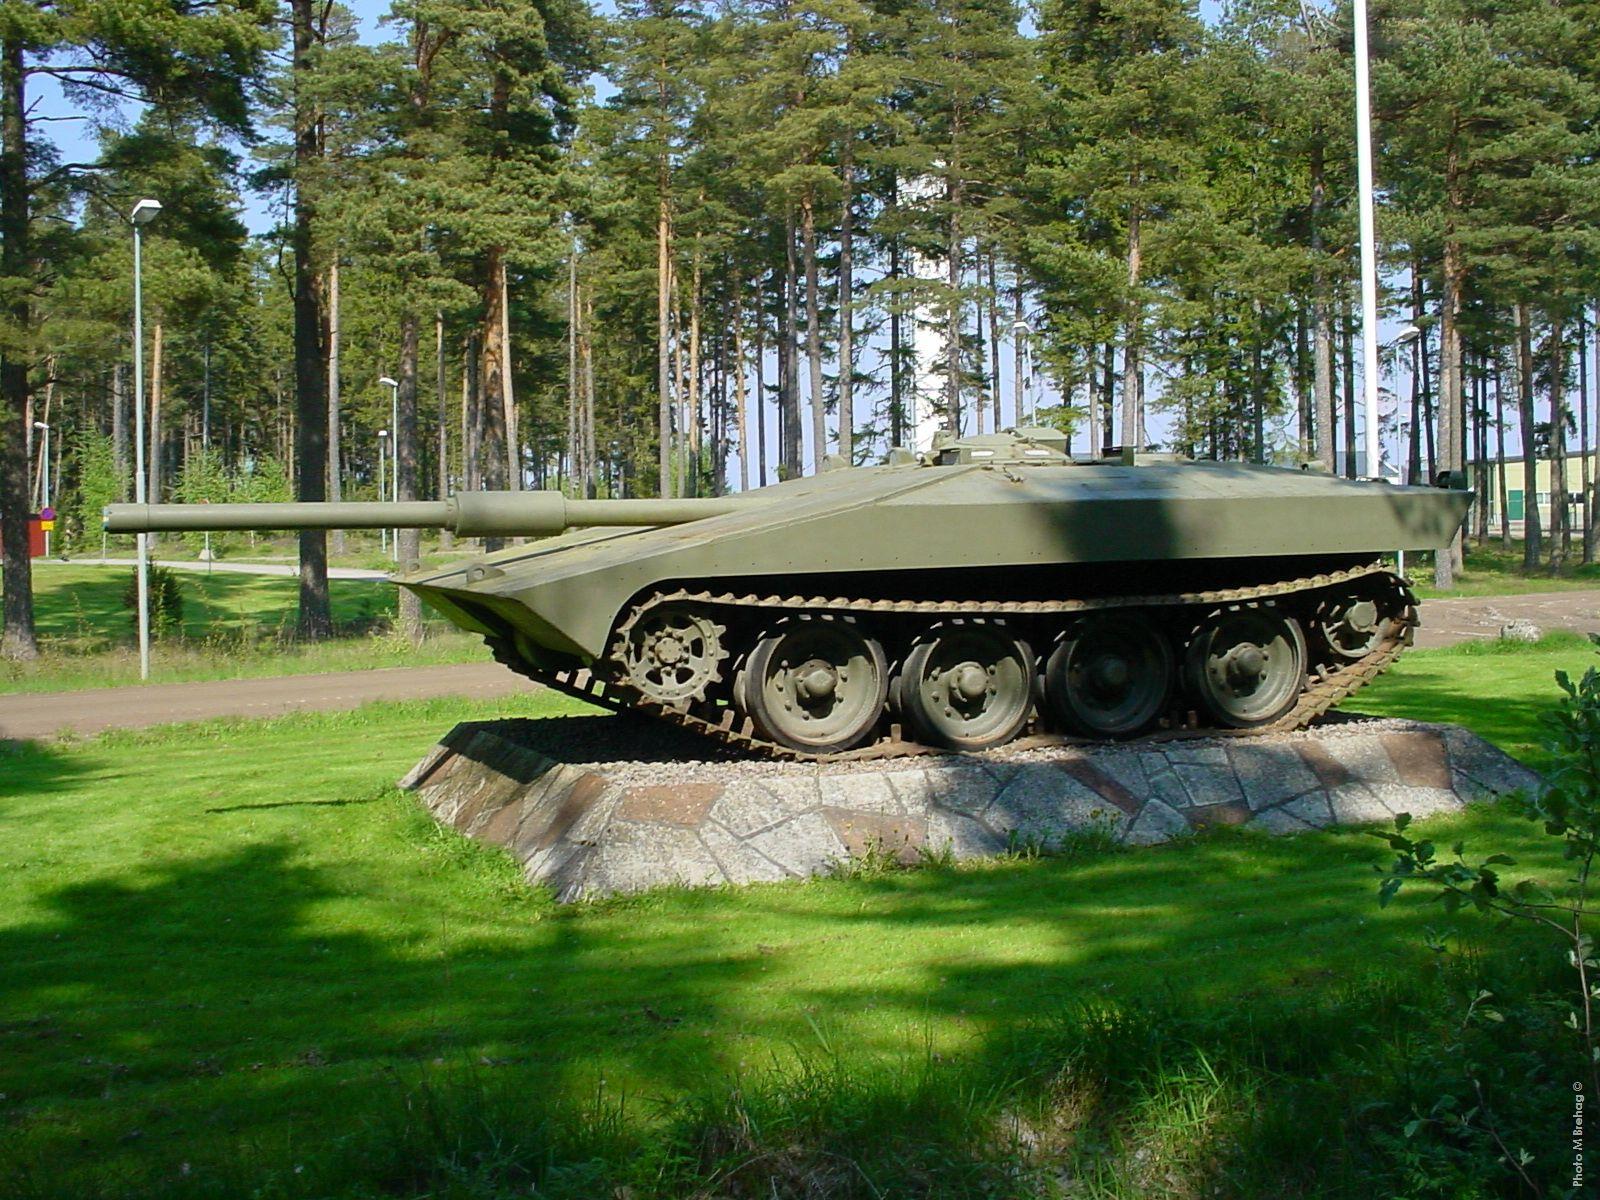 StridsvagnS1_history2.jpg